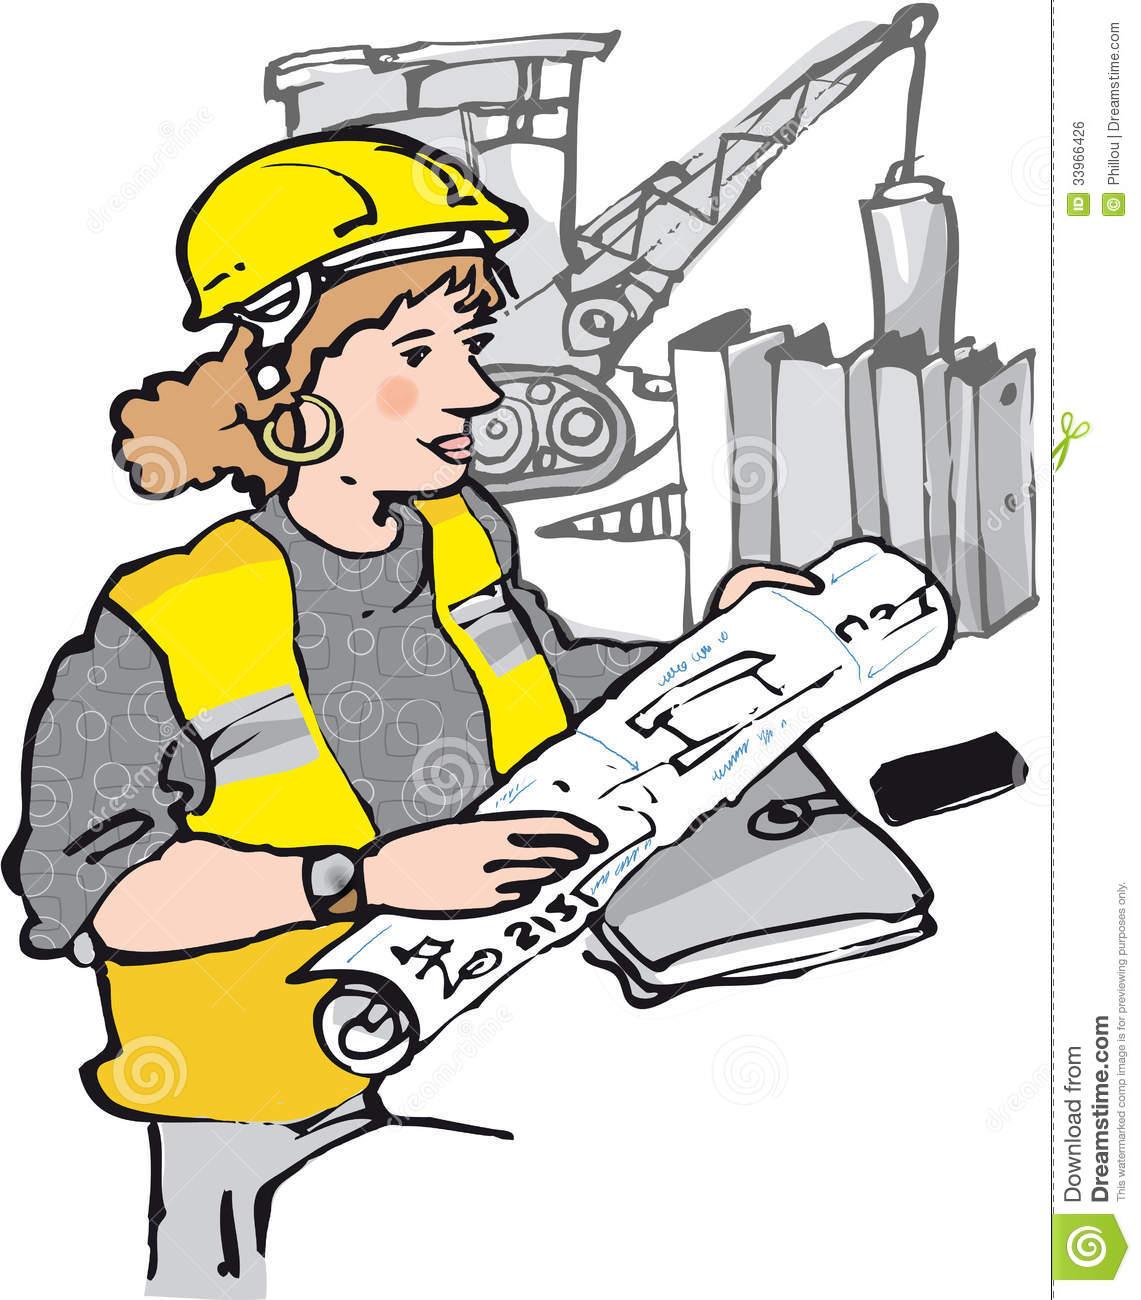 Civil engineering clipart clipart transparent download Female Civil Engineering Clip Art Female Free Engine - Free Clipart clipart transparent download